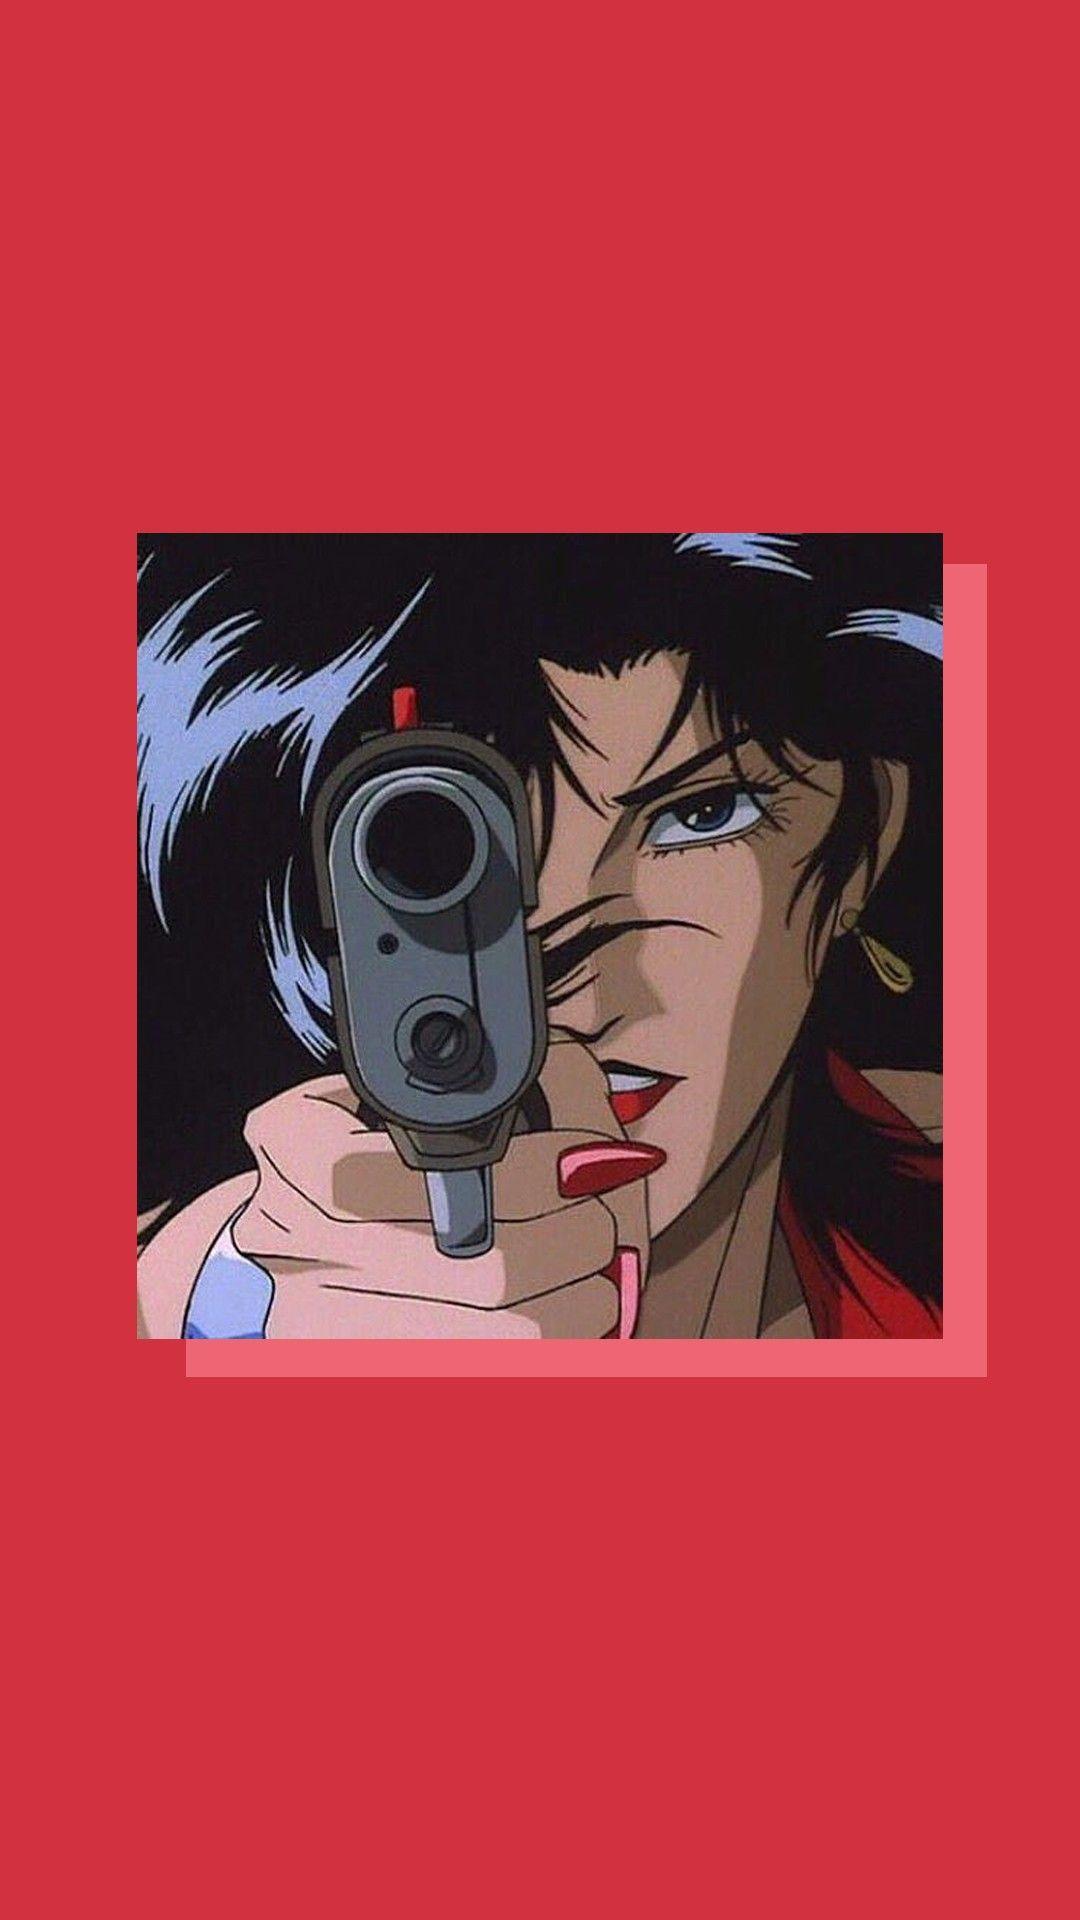 Pin by Dante S on Lockscreens Anime wallpaper iphone